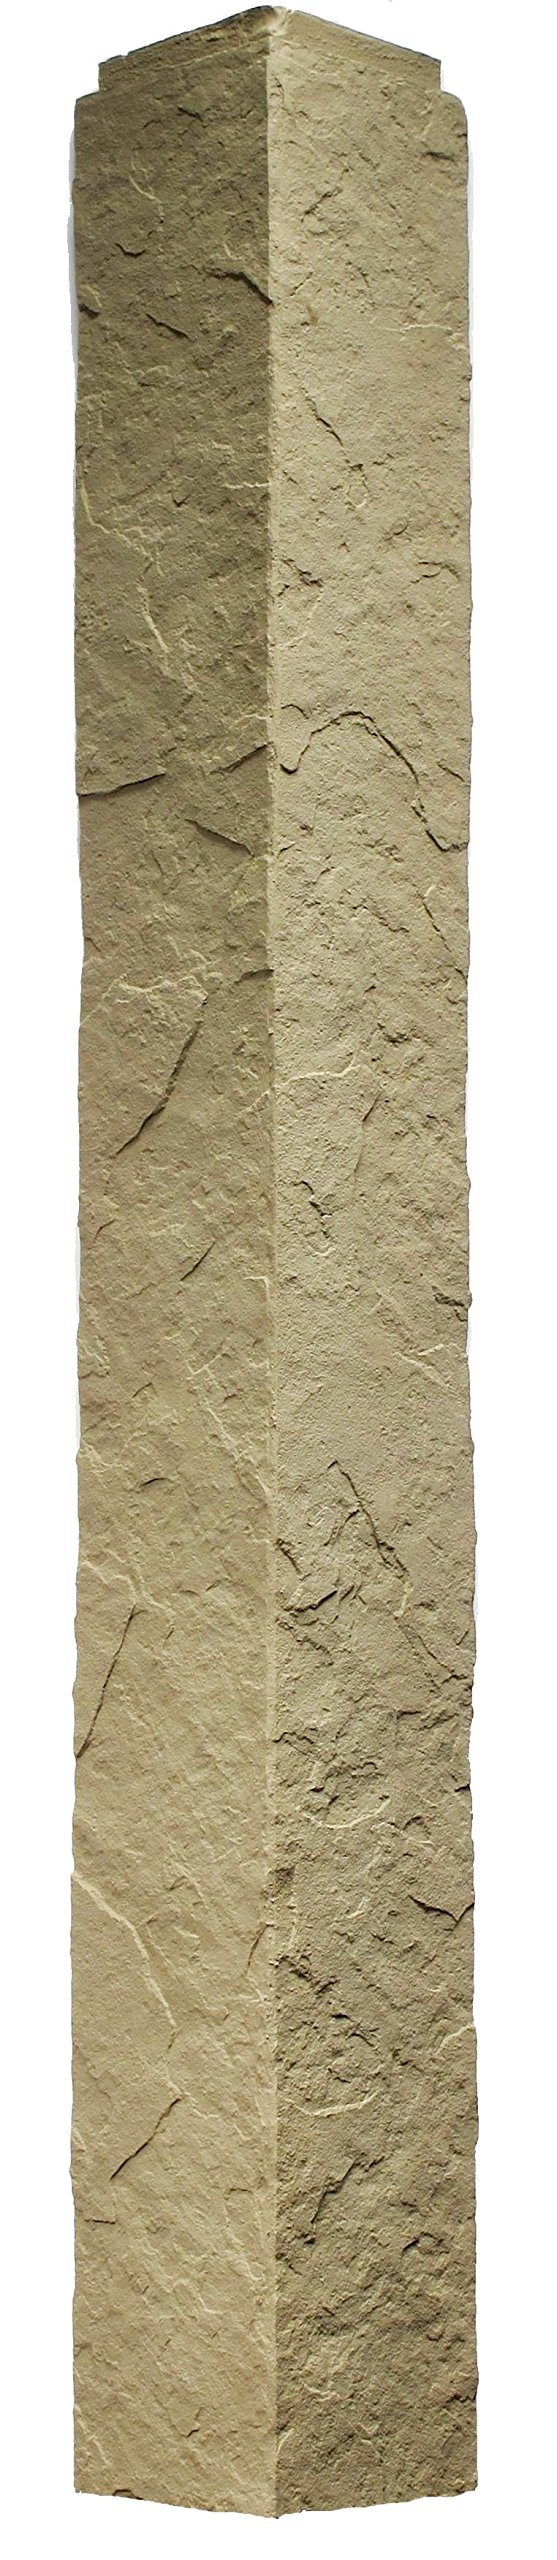 NextStone Sandstone 4 Foot Outside Corner Buff 2 Pack